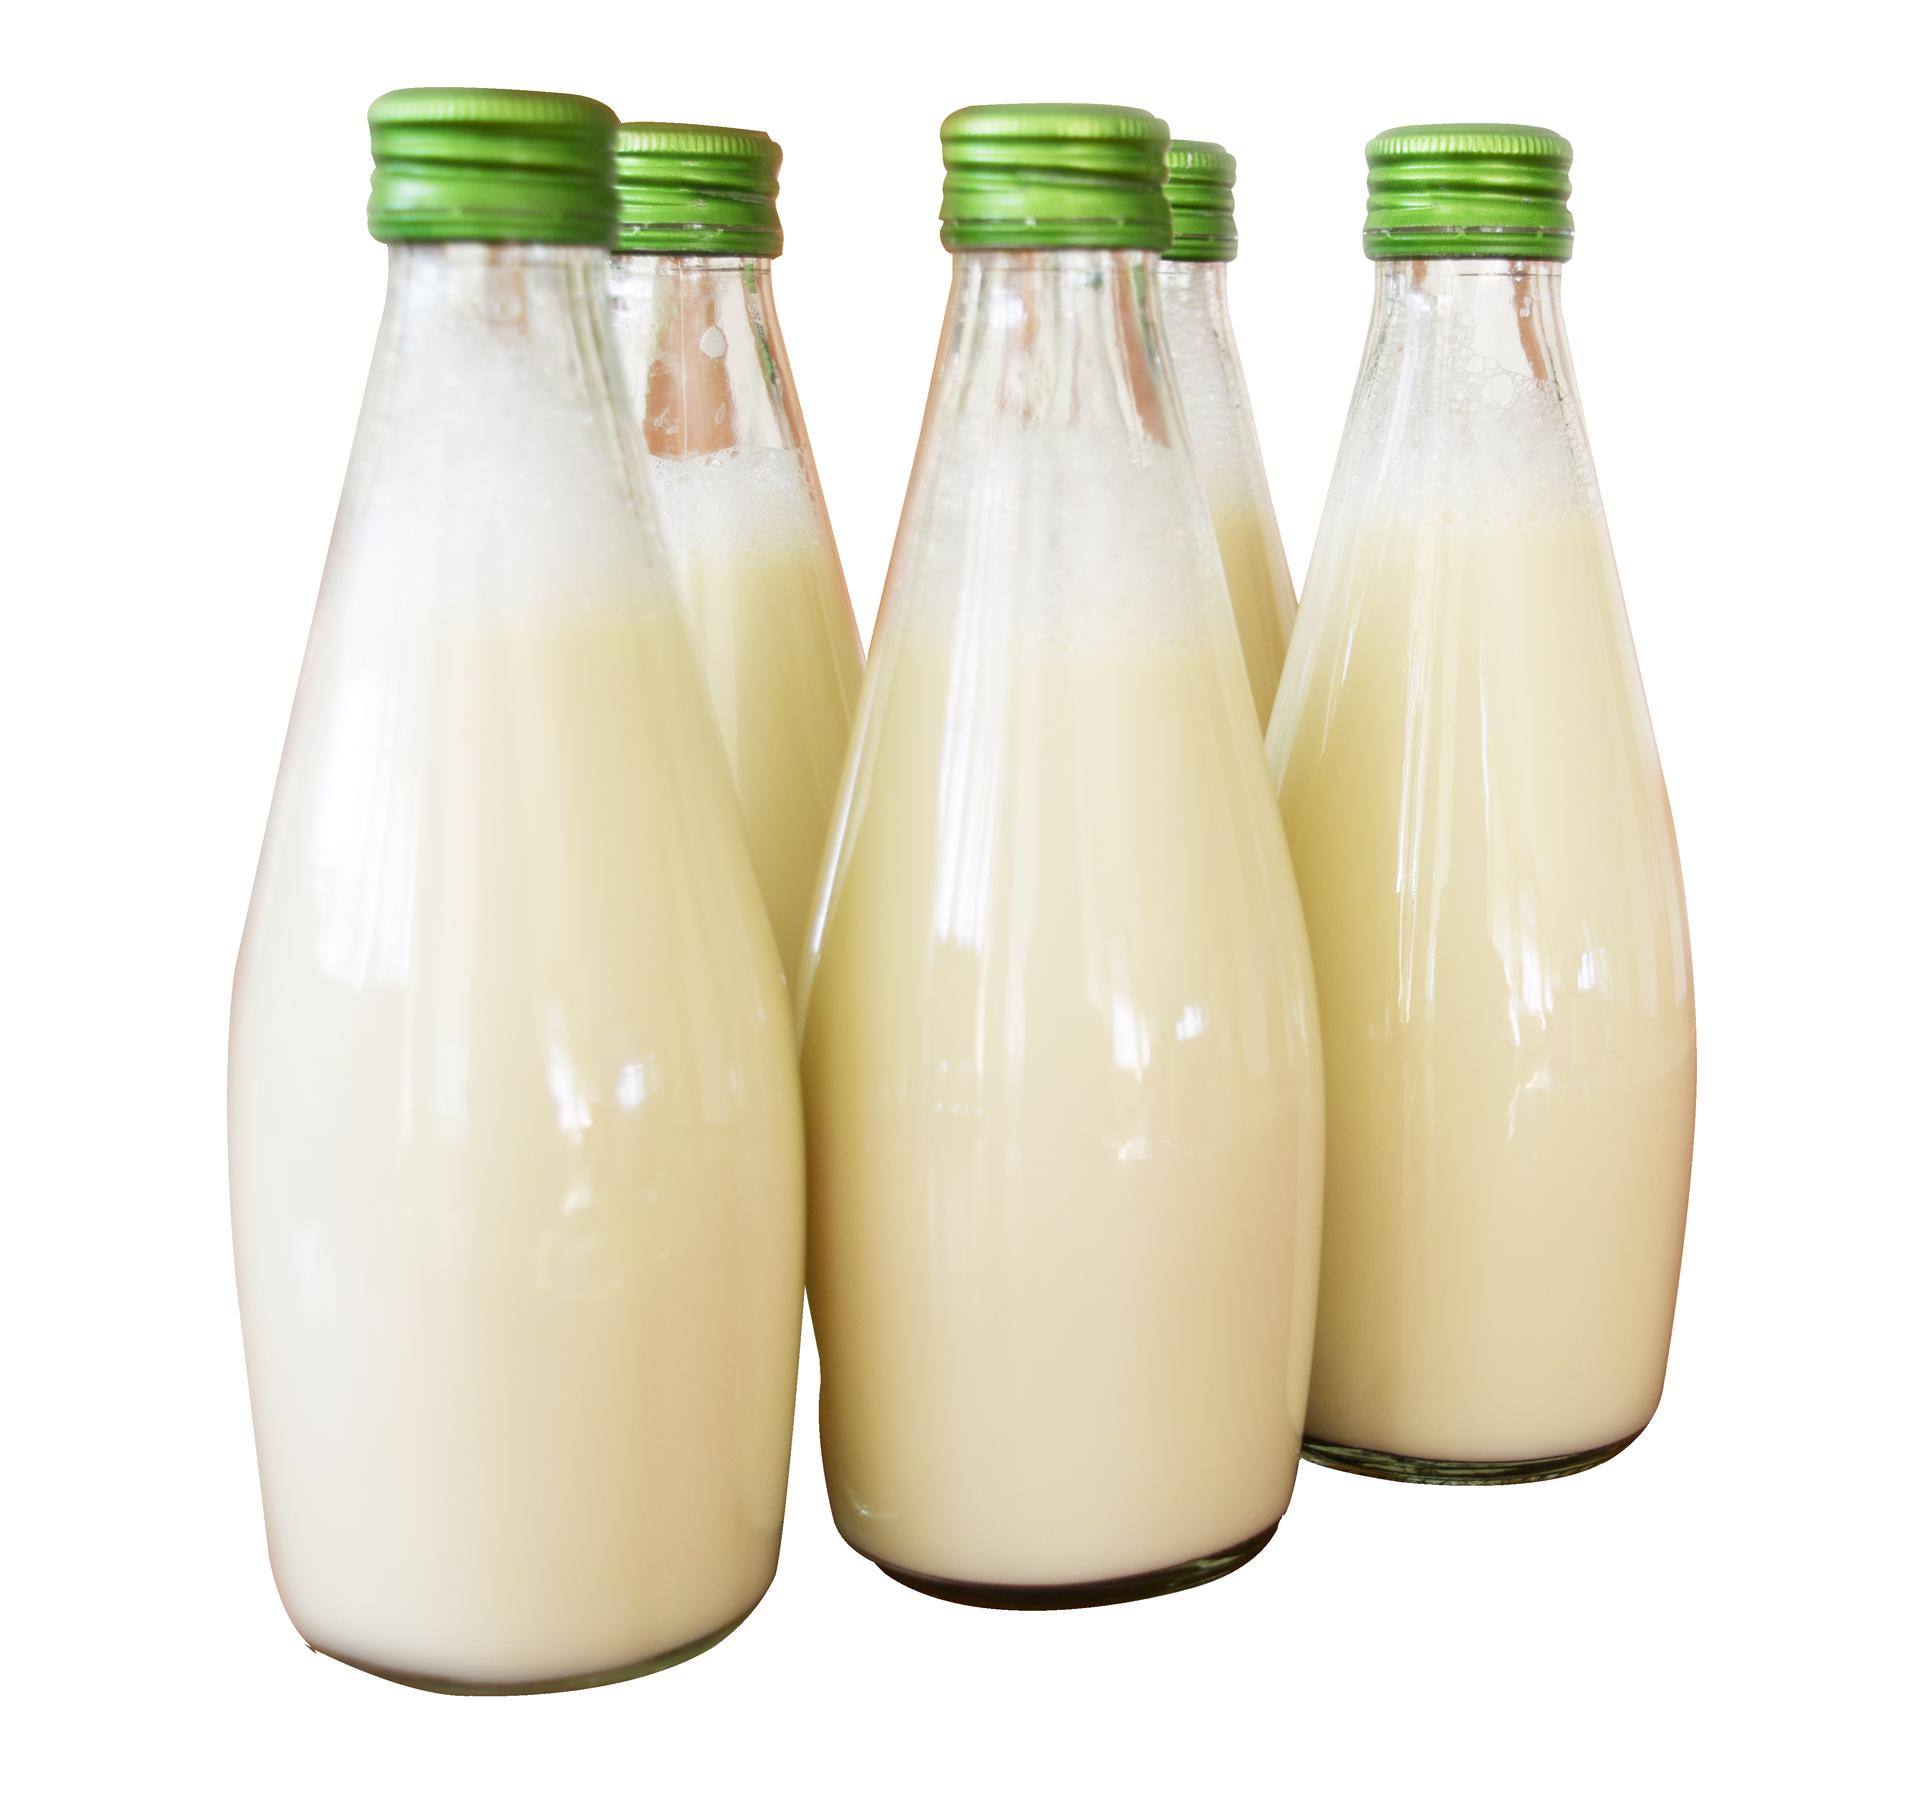 PNG Milk Bottle-PlusPNG.com-1912 - PNG Milk Bottle